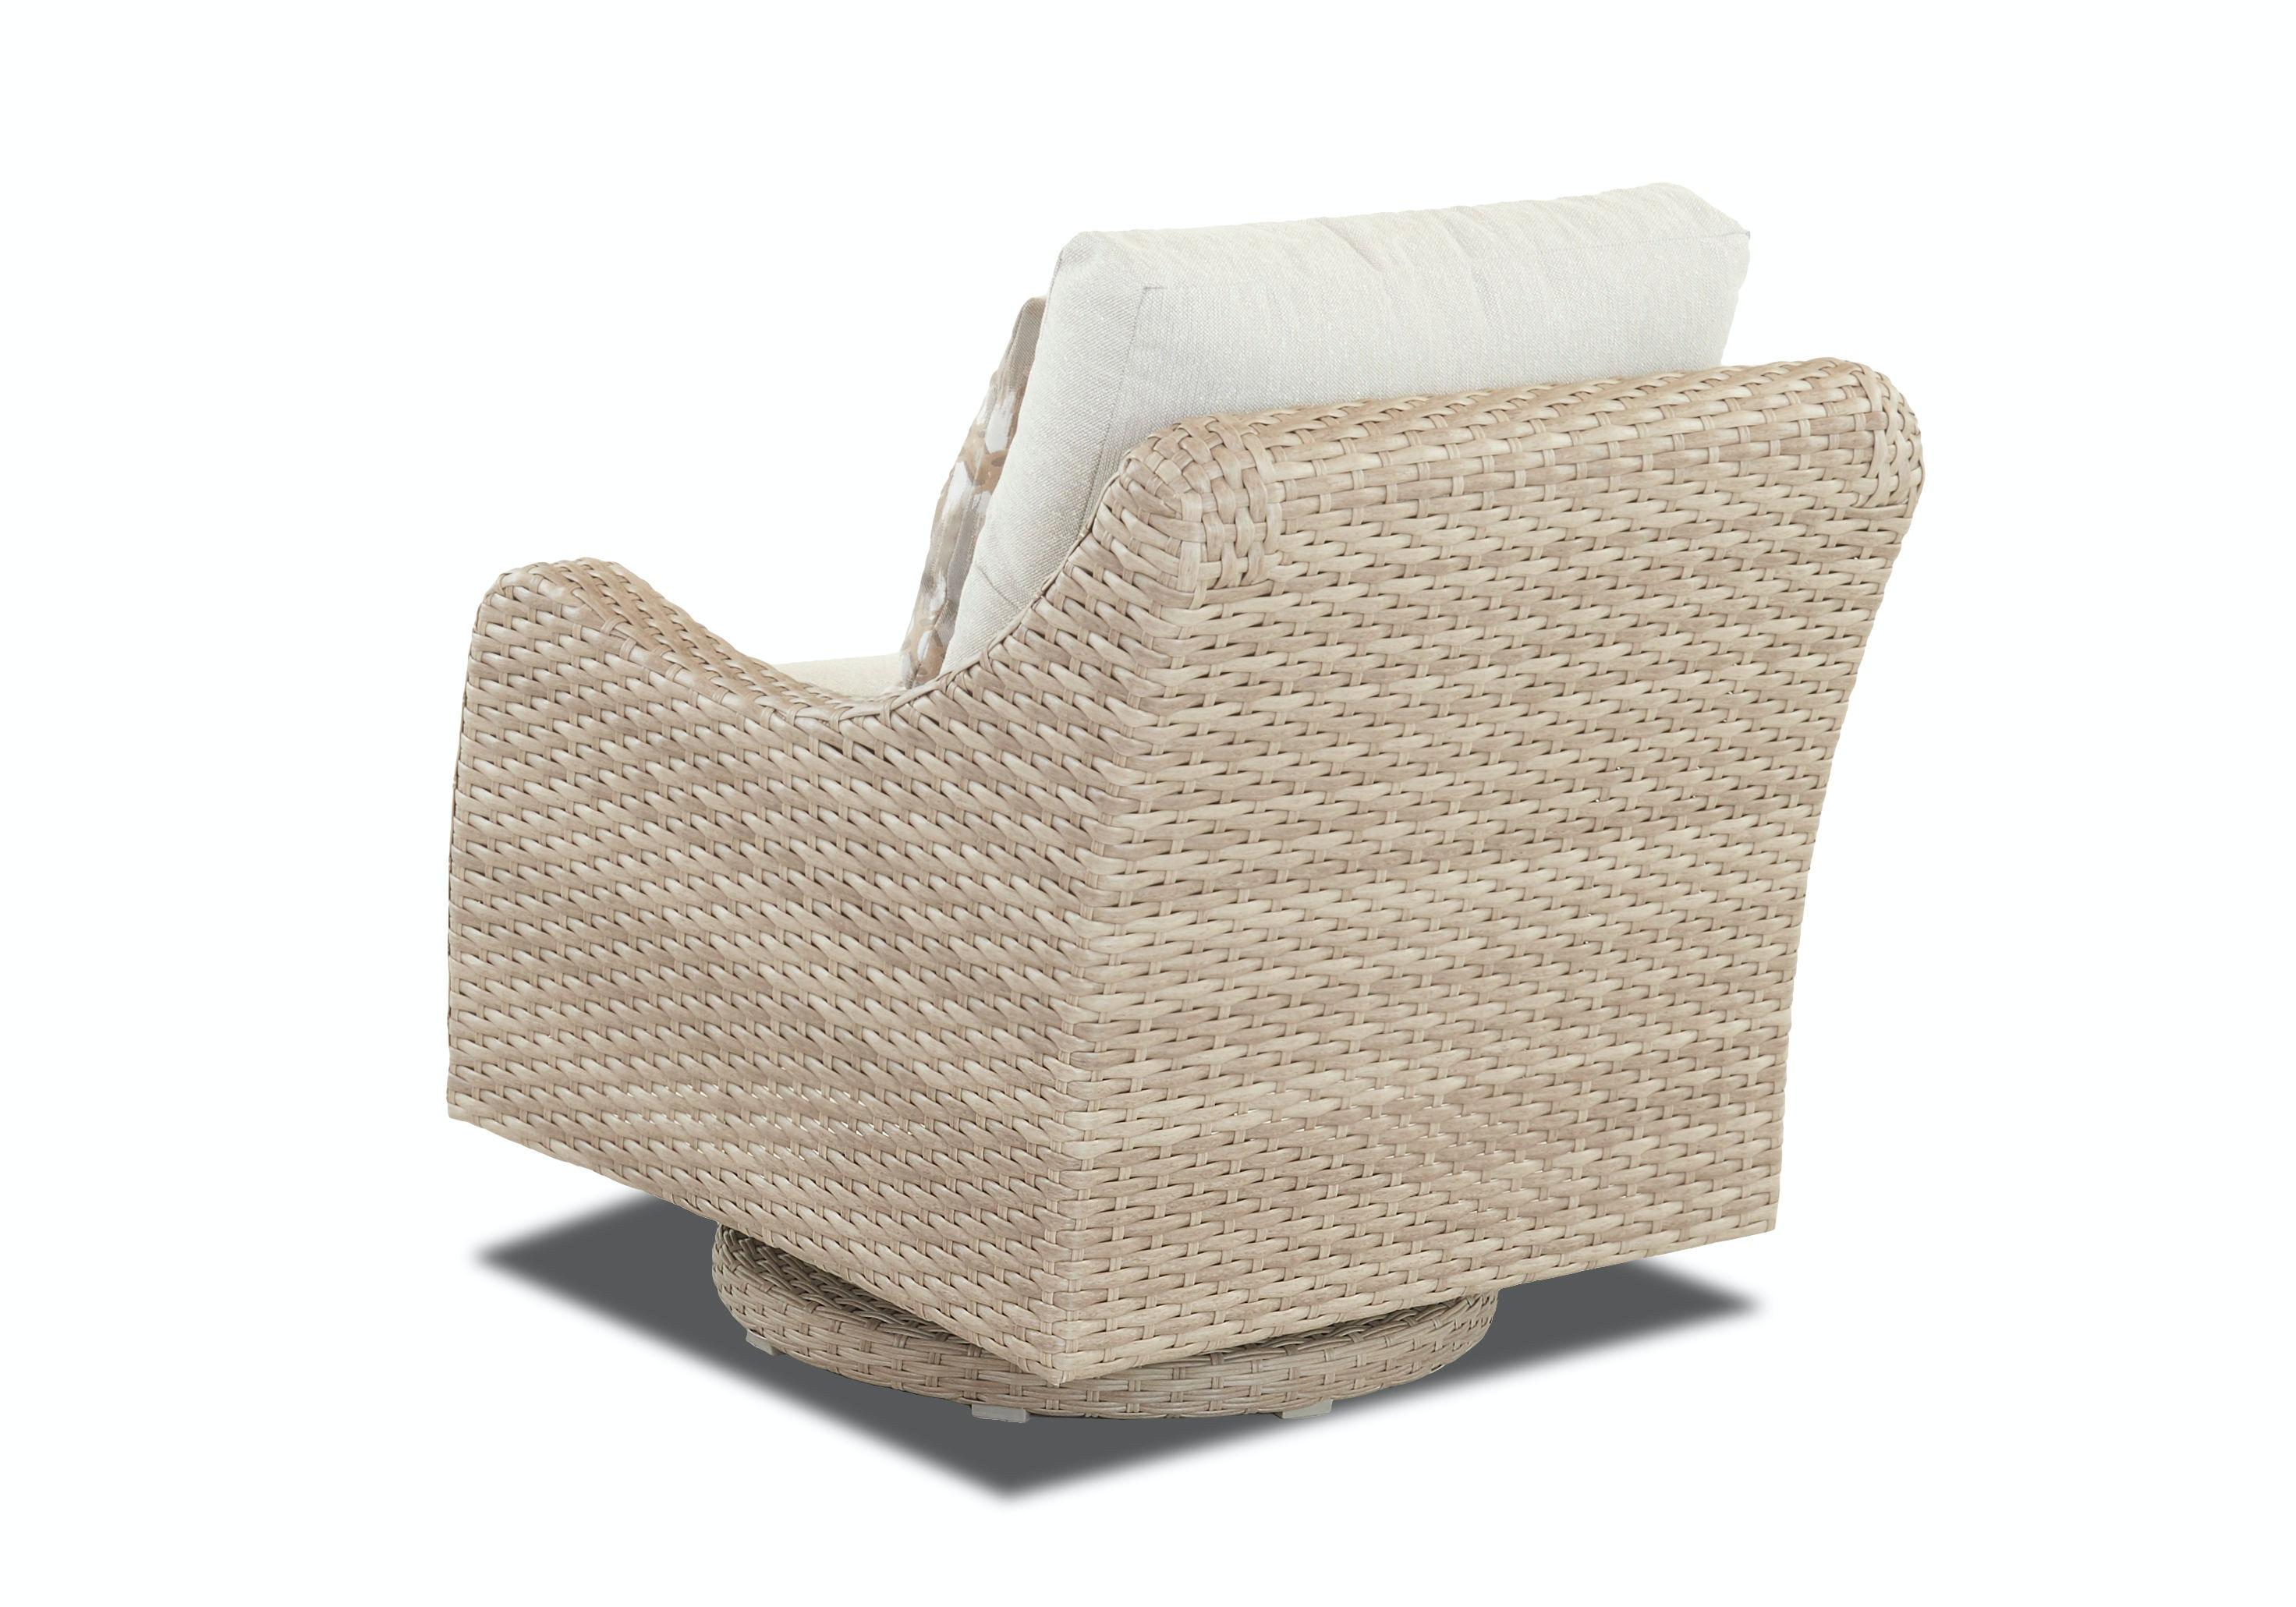 Klaussner Outdoor Mesa Swivel Rocking Chair W7501 SRKC